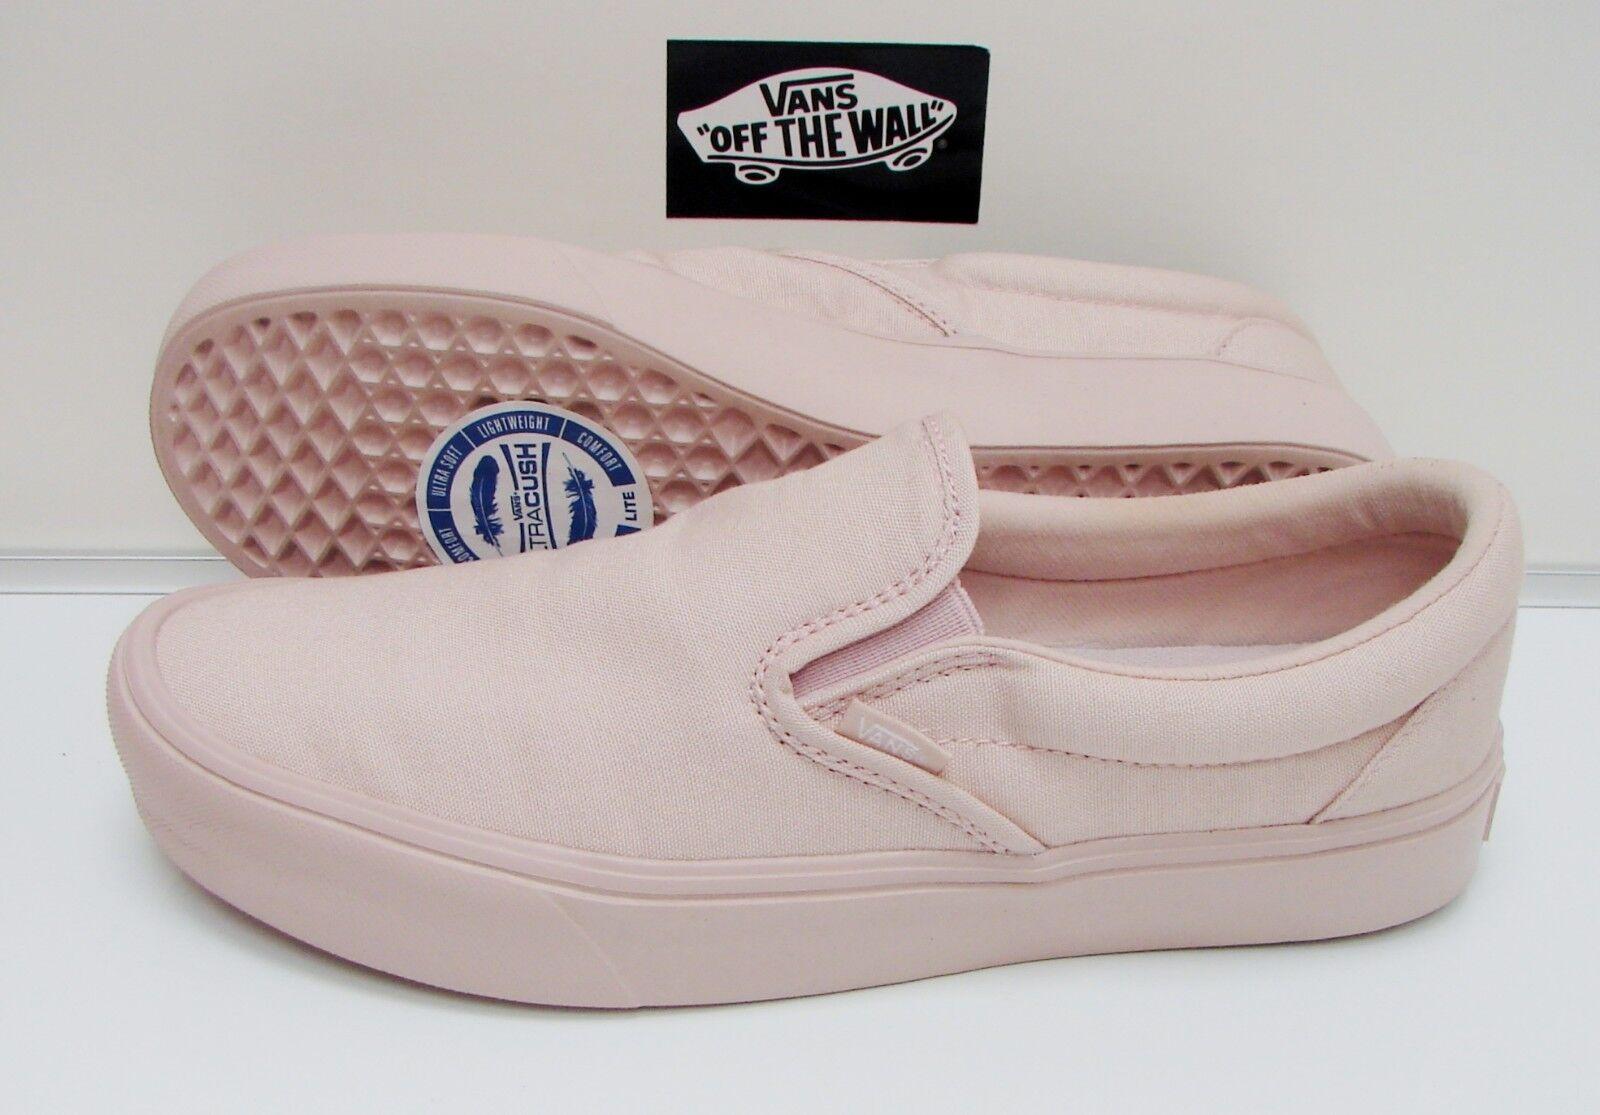 VANS SLIP-ON (LITE) SEPIA pink VN-0A2Z63O3N MEN'S